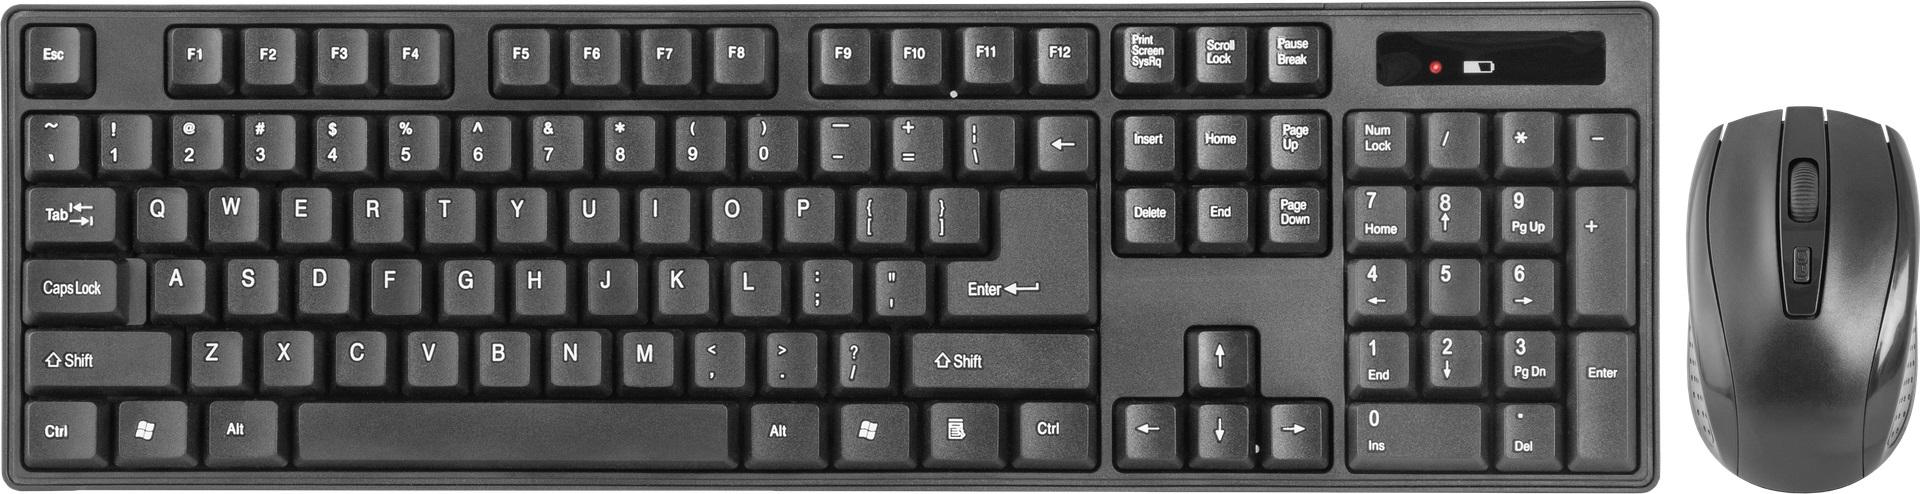 DEFENDER C-915 wireless keyboard RU black full-sized